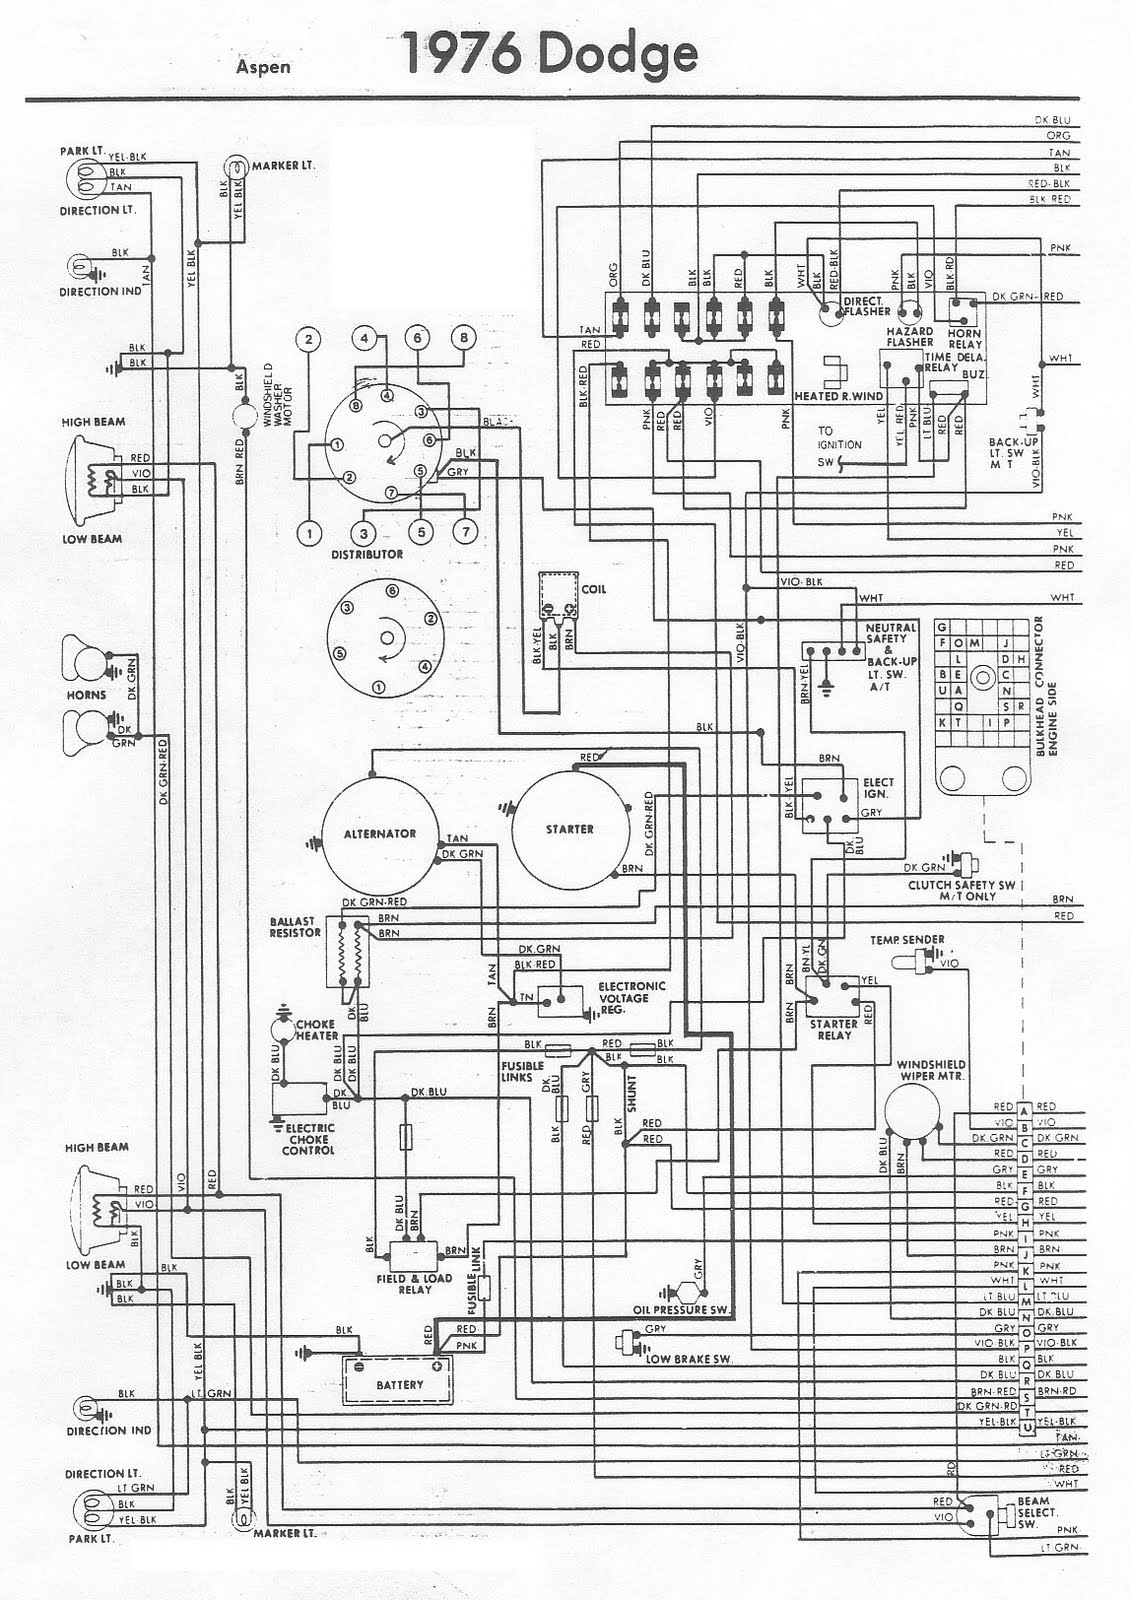 Sterling Truck Ac Wiring Diagram Free Auto Wiring Diagram 1976 Dodge Aspen Engine